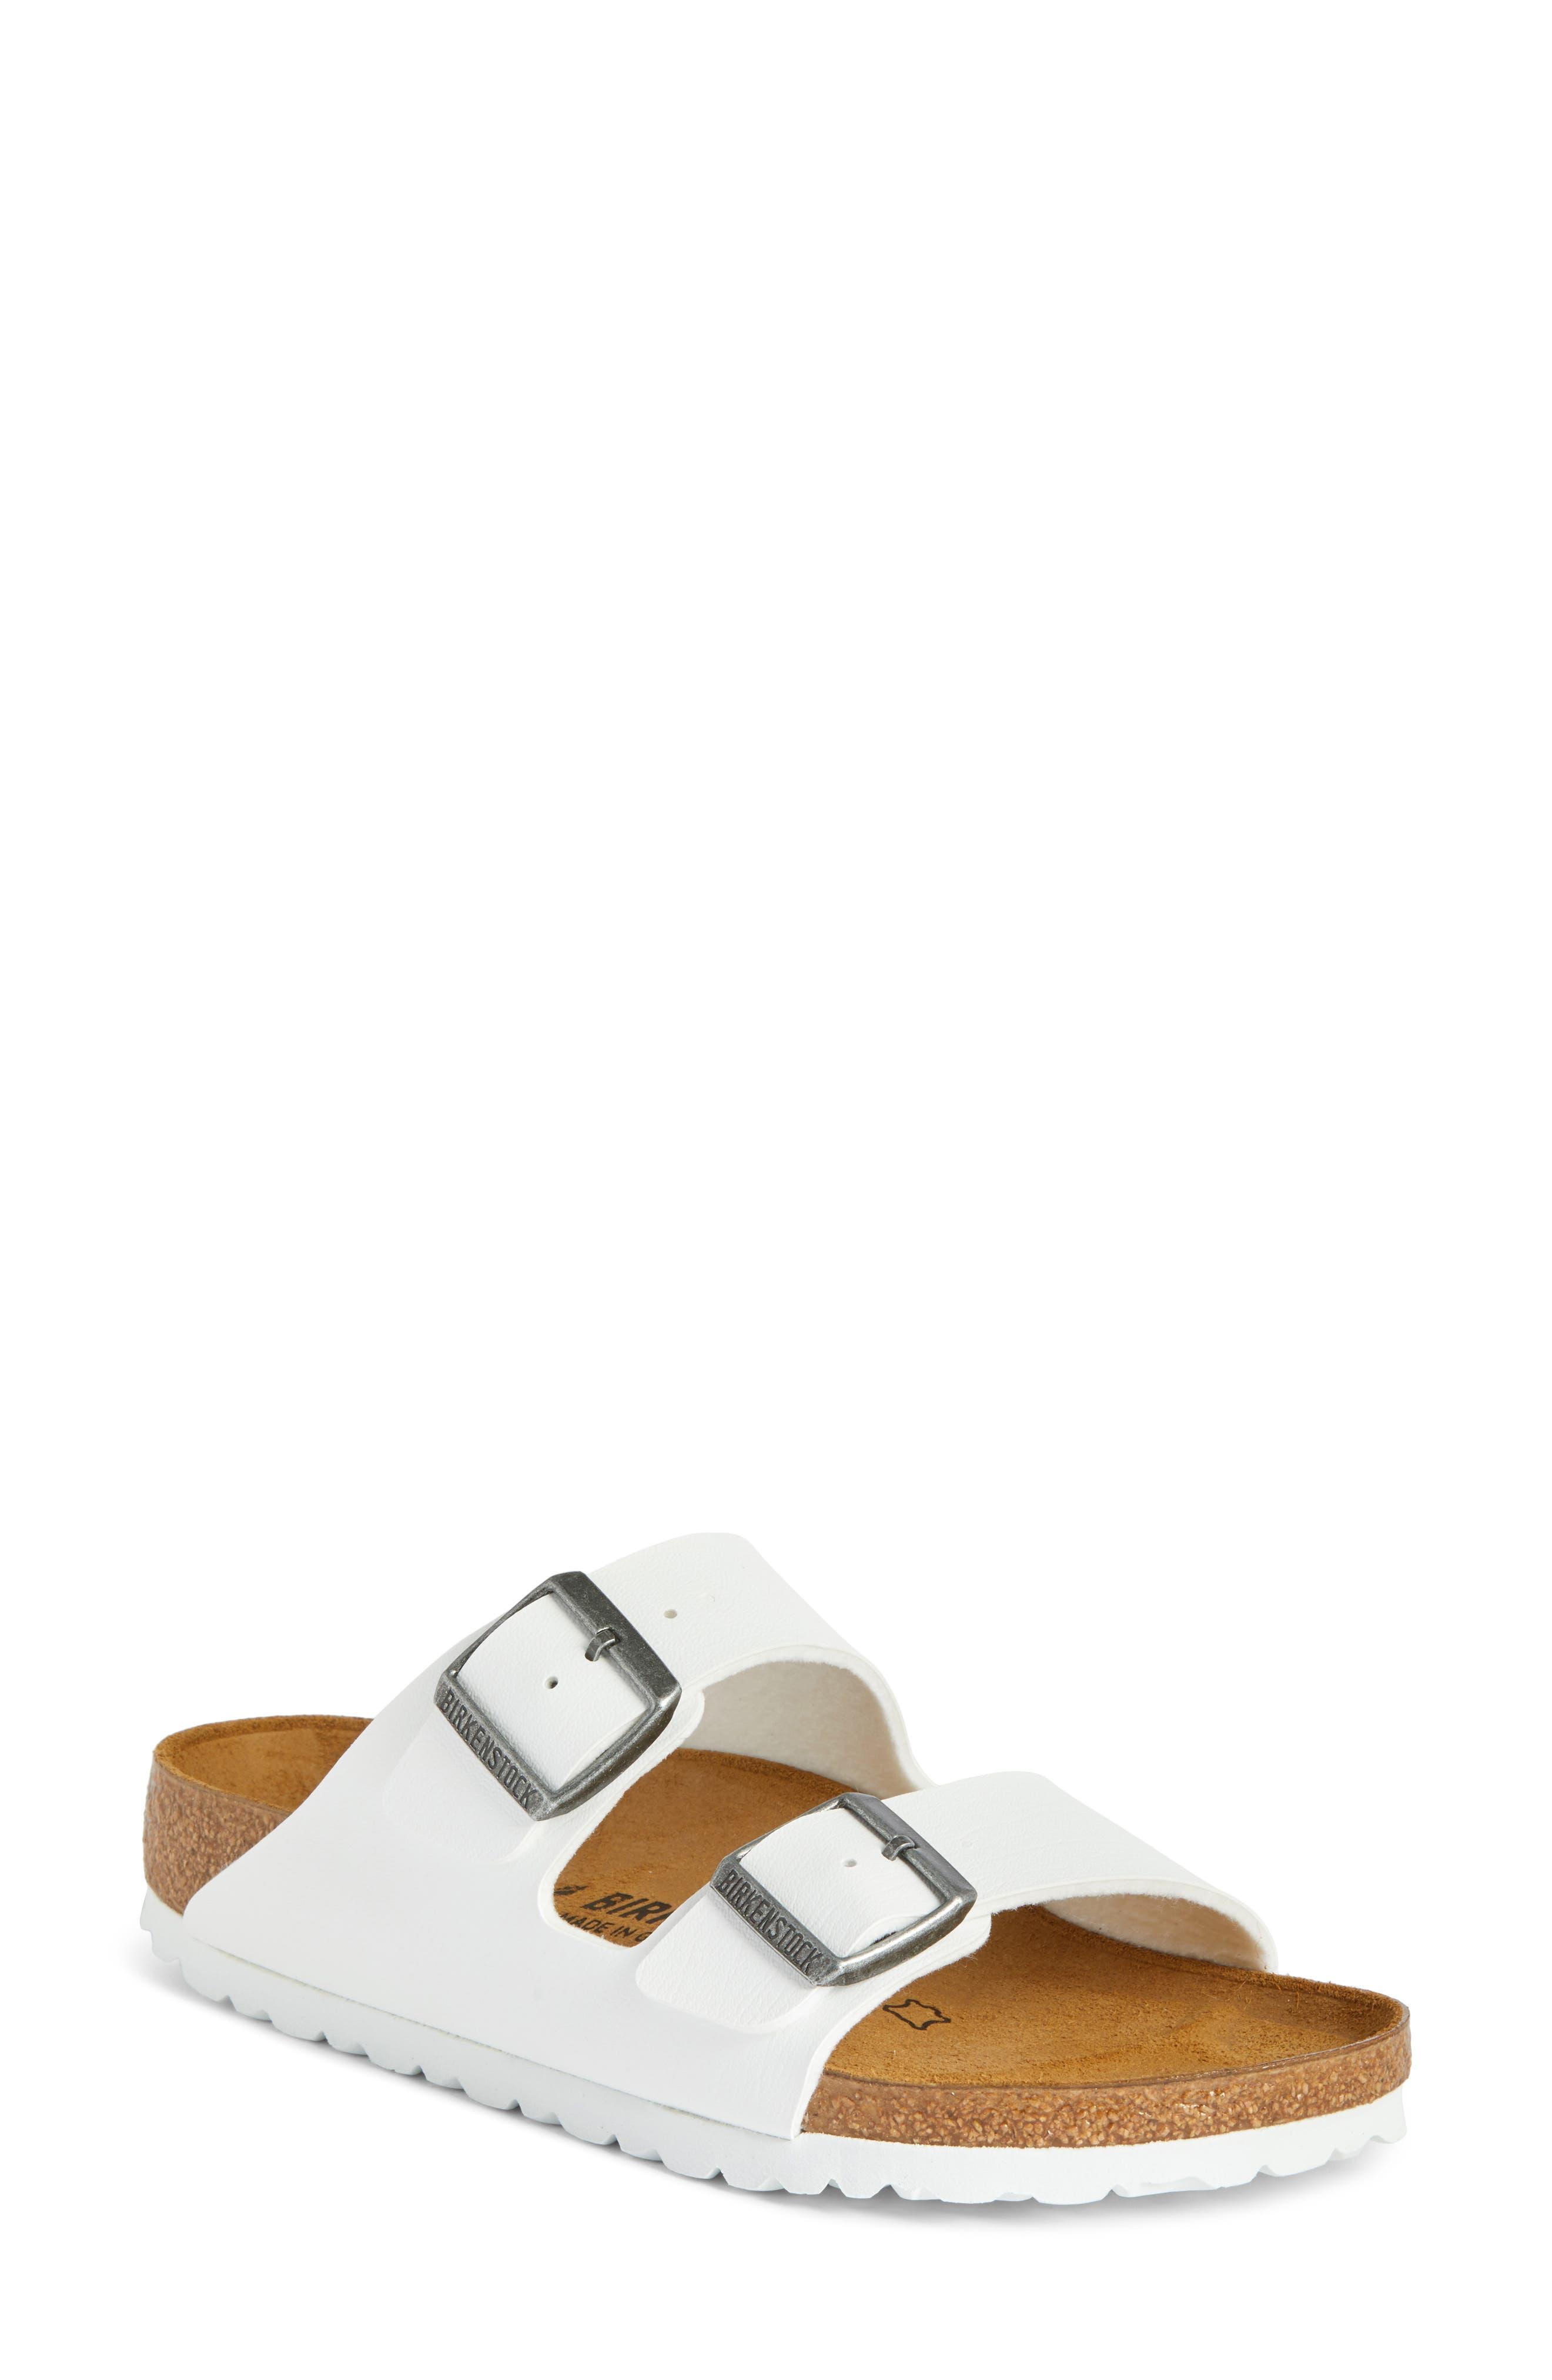 BIRKENSTOCK, 'Arizona' White Birko-Flor Sandal, Main thumbnail 1, color, WHITE SYNTHETIC LEATHER